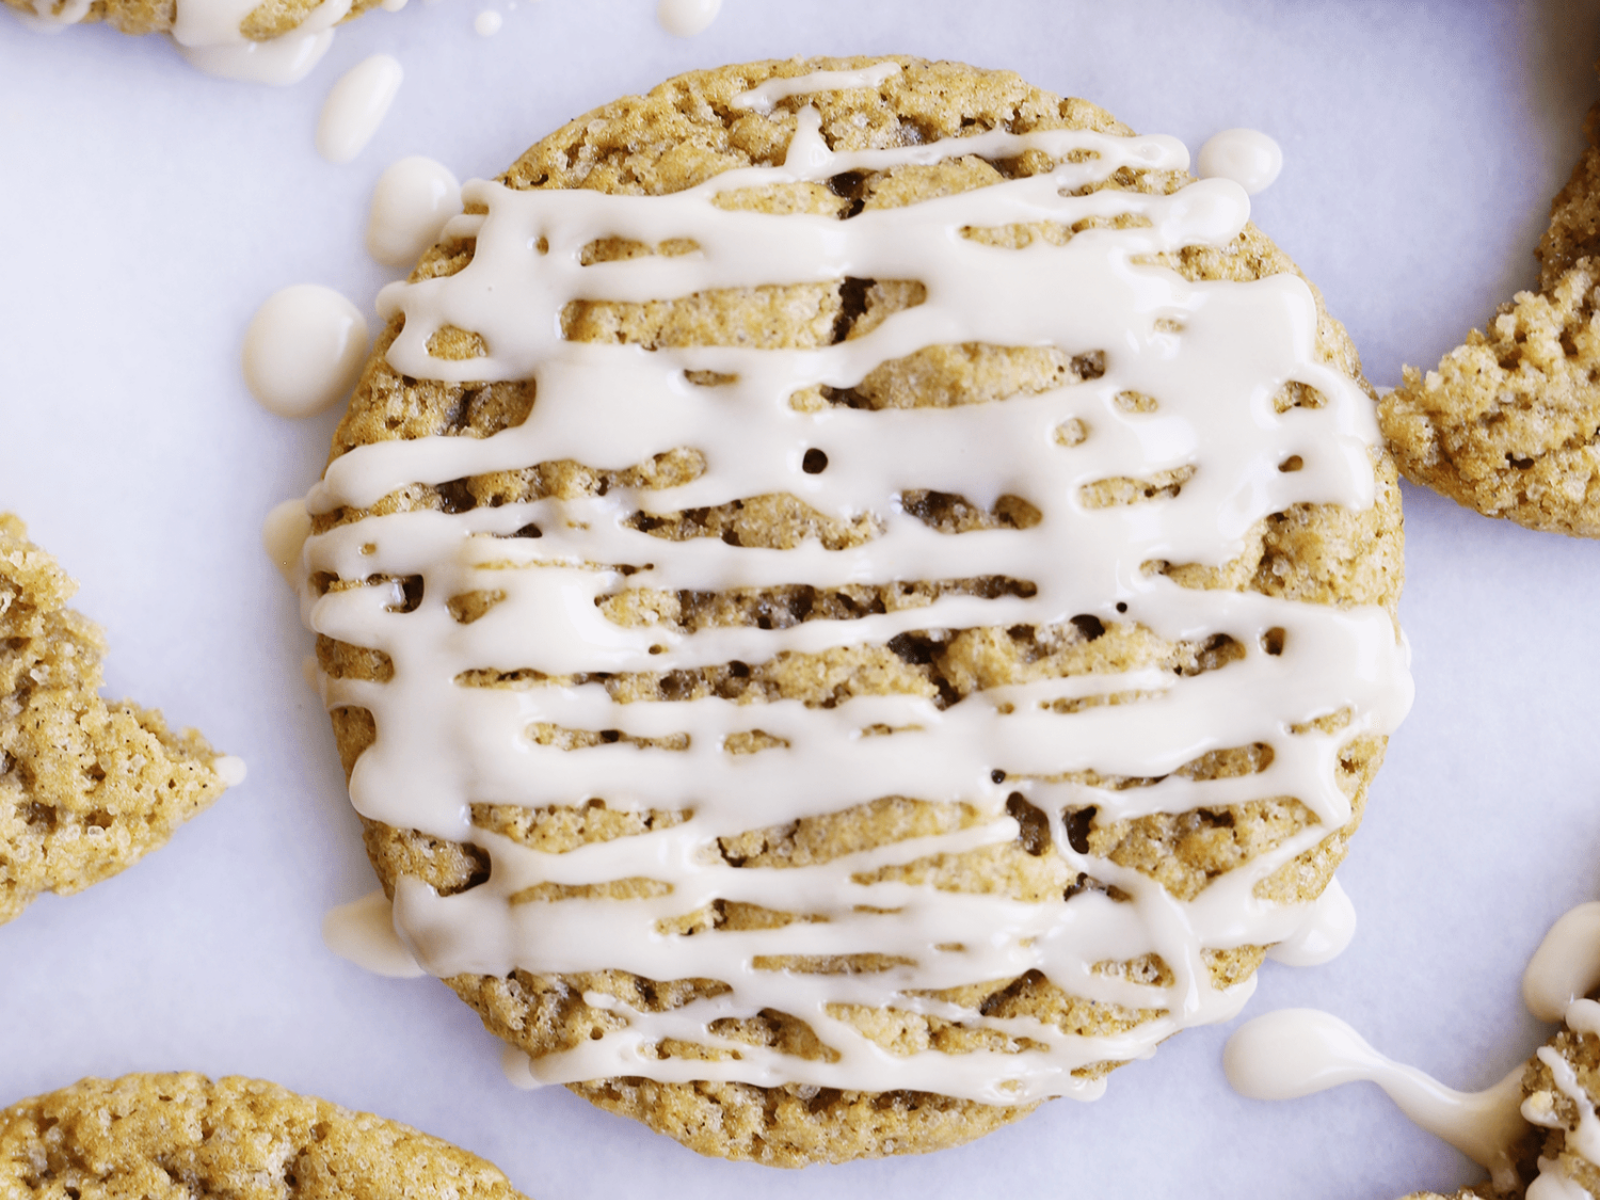 Vegan apple cider cookies